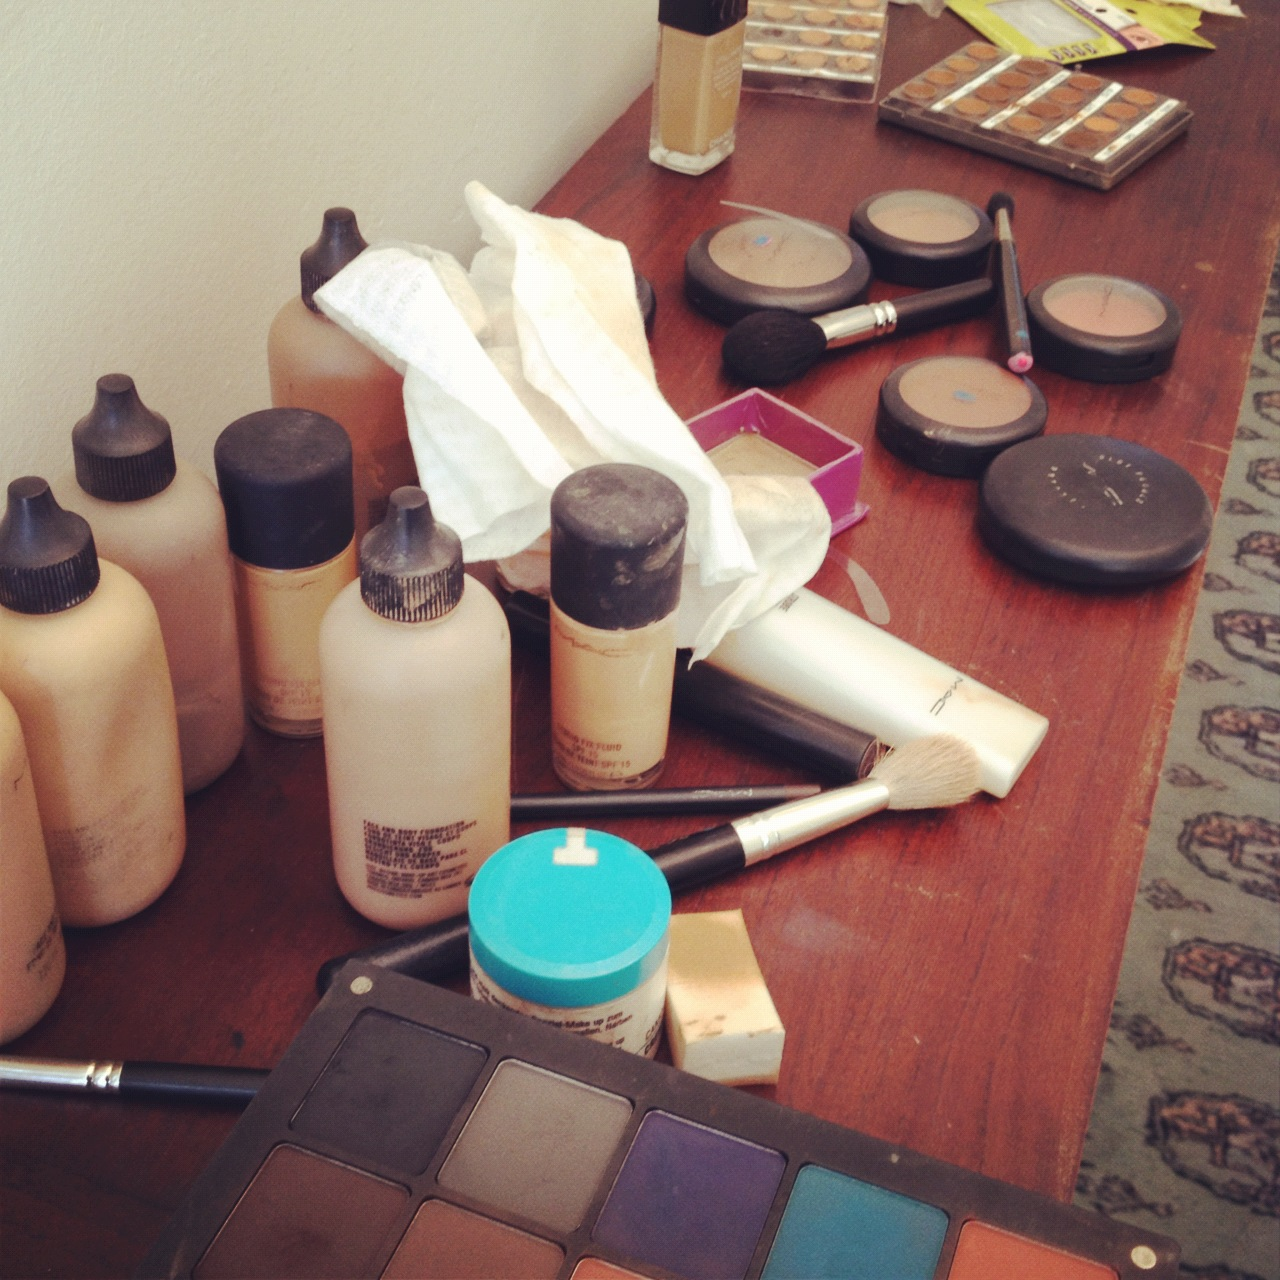 pout-school-of-fashion-makeup-day-1